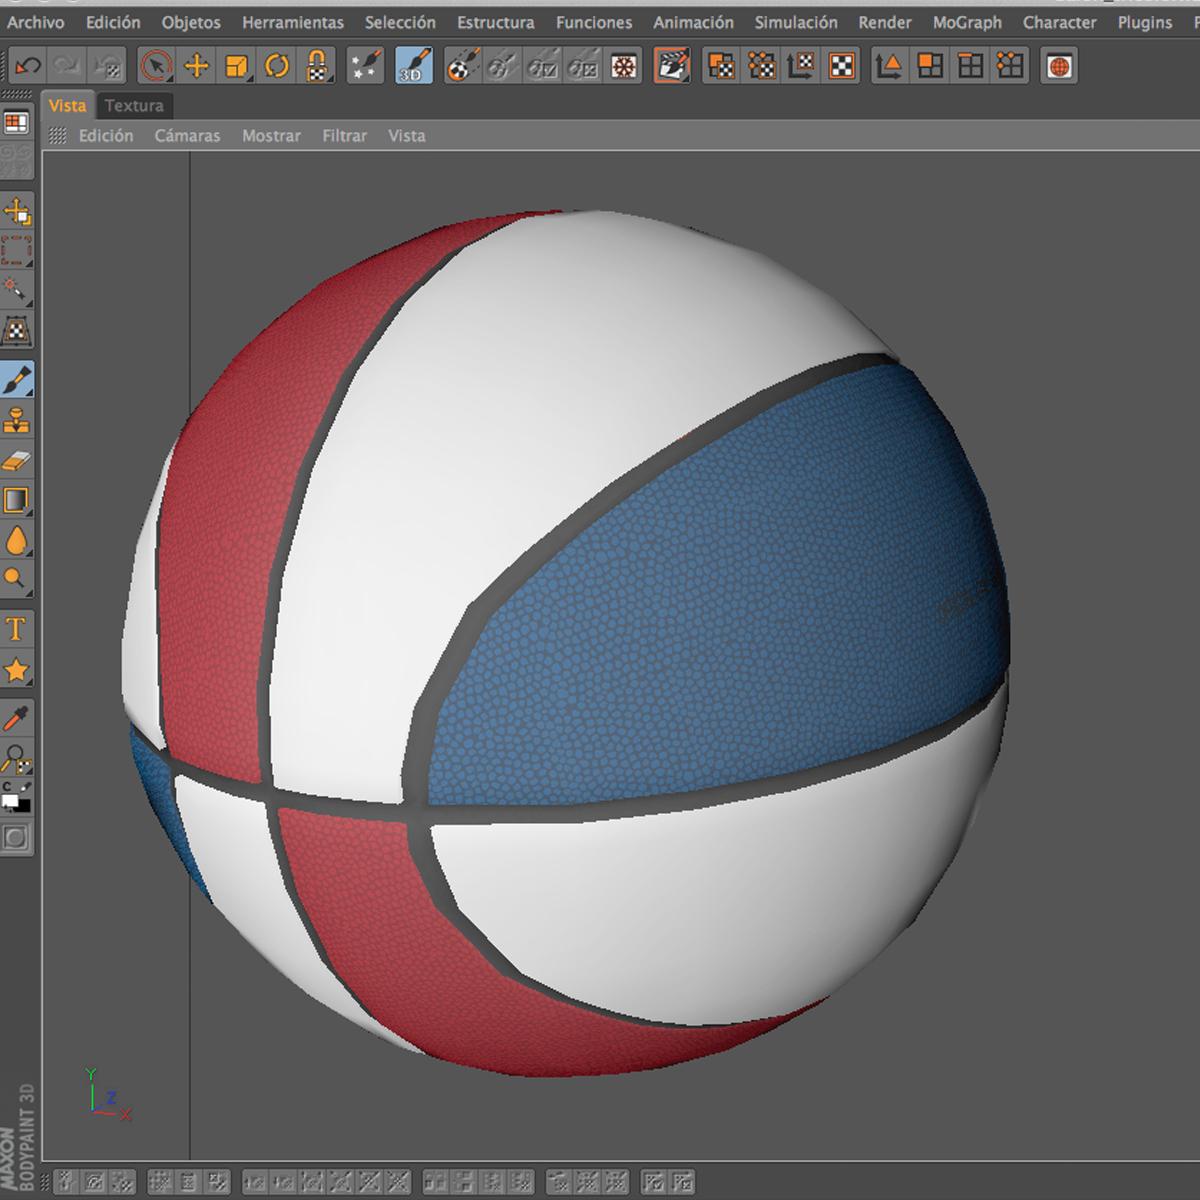 tricolor basketball ball 3d model 3ds max fbx c4d ma mb obj 164856